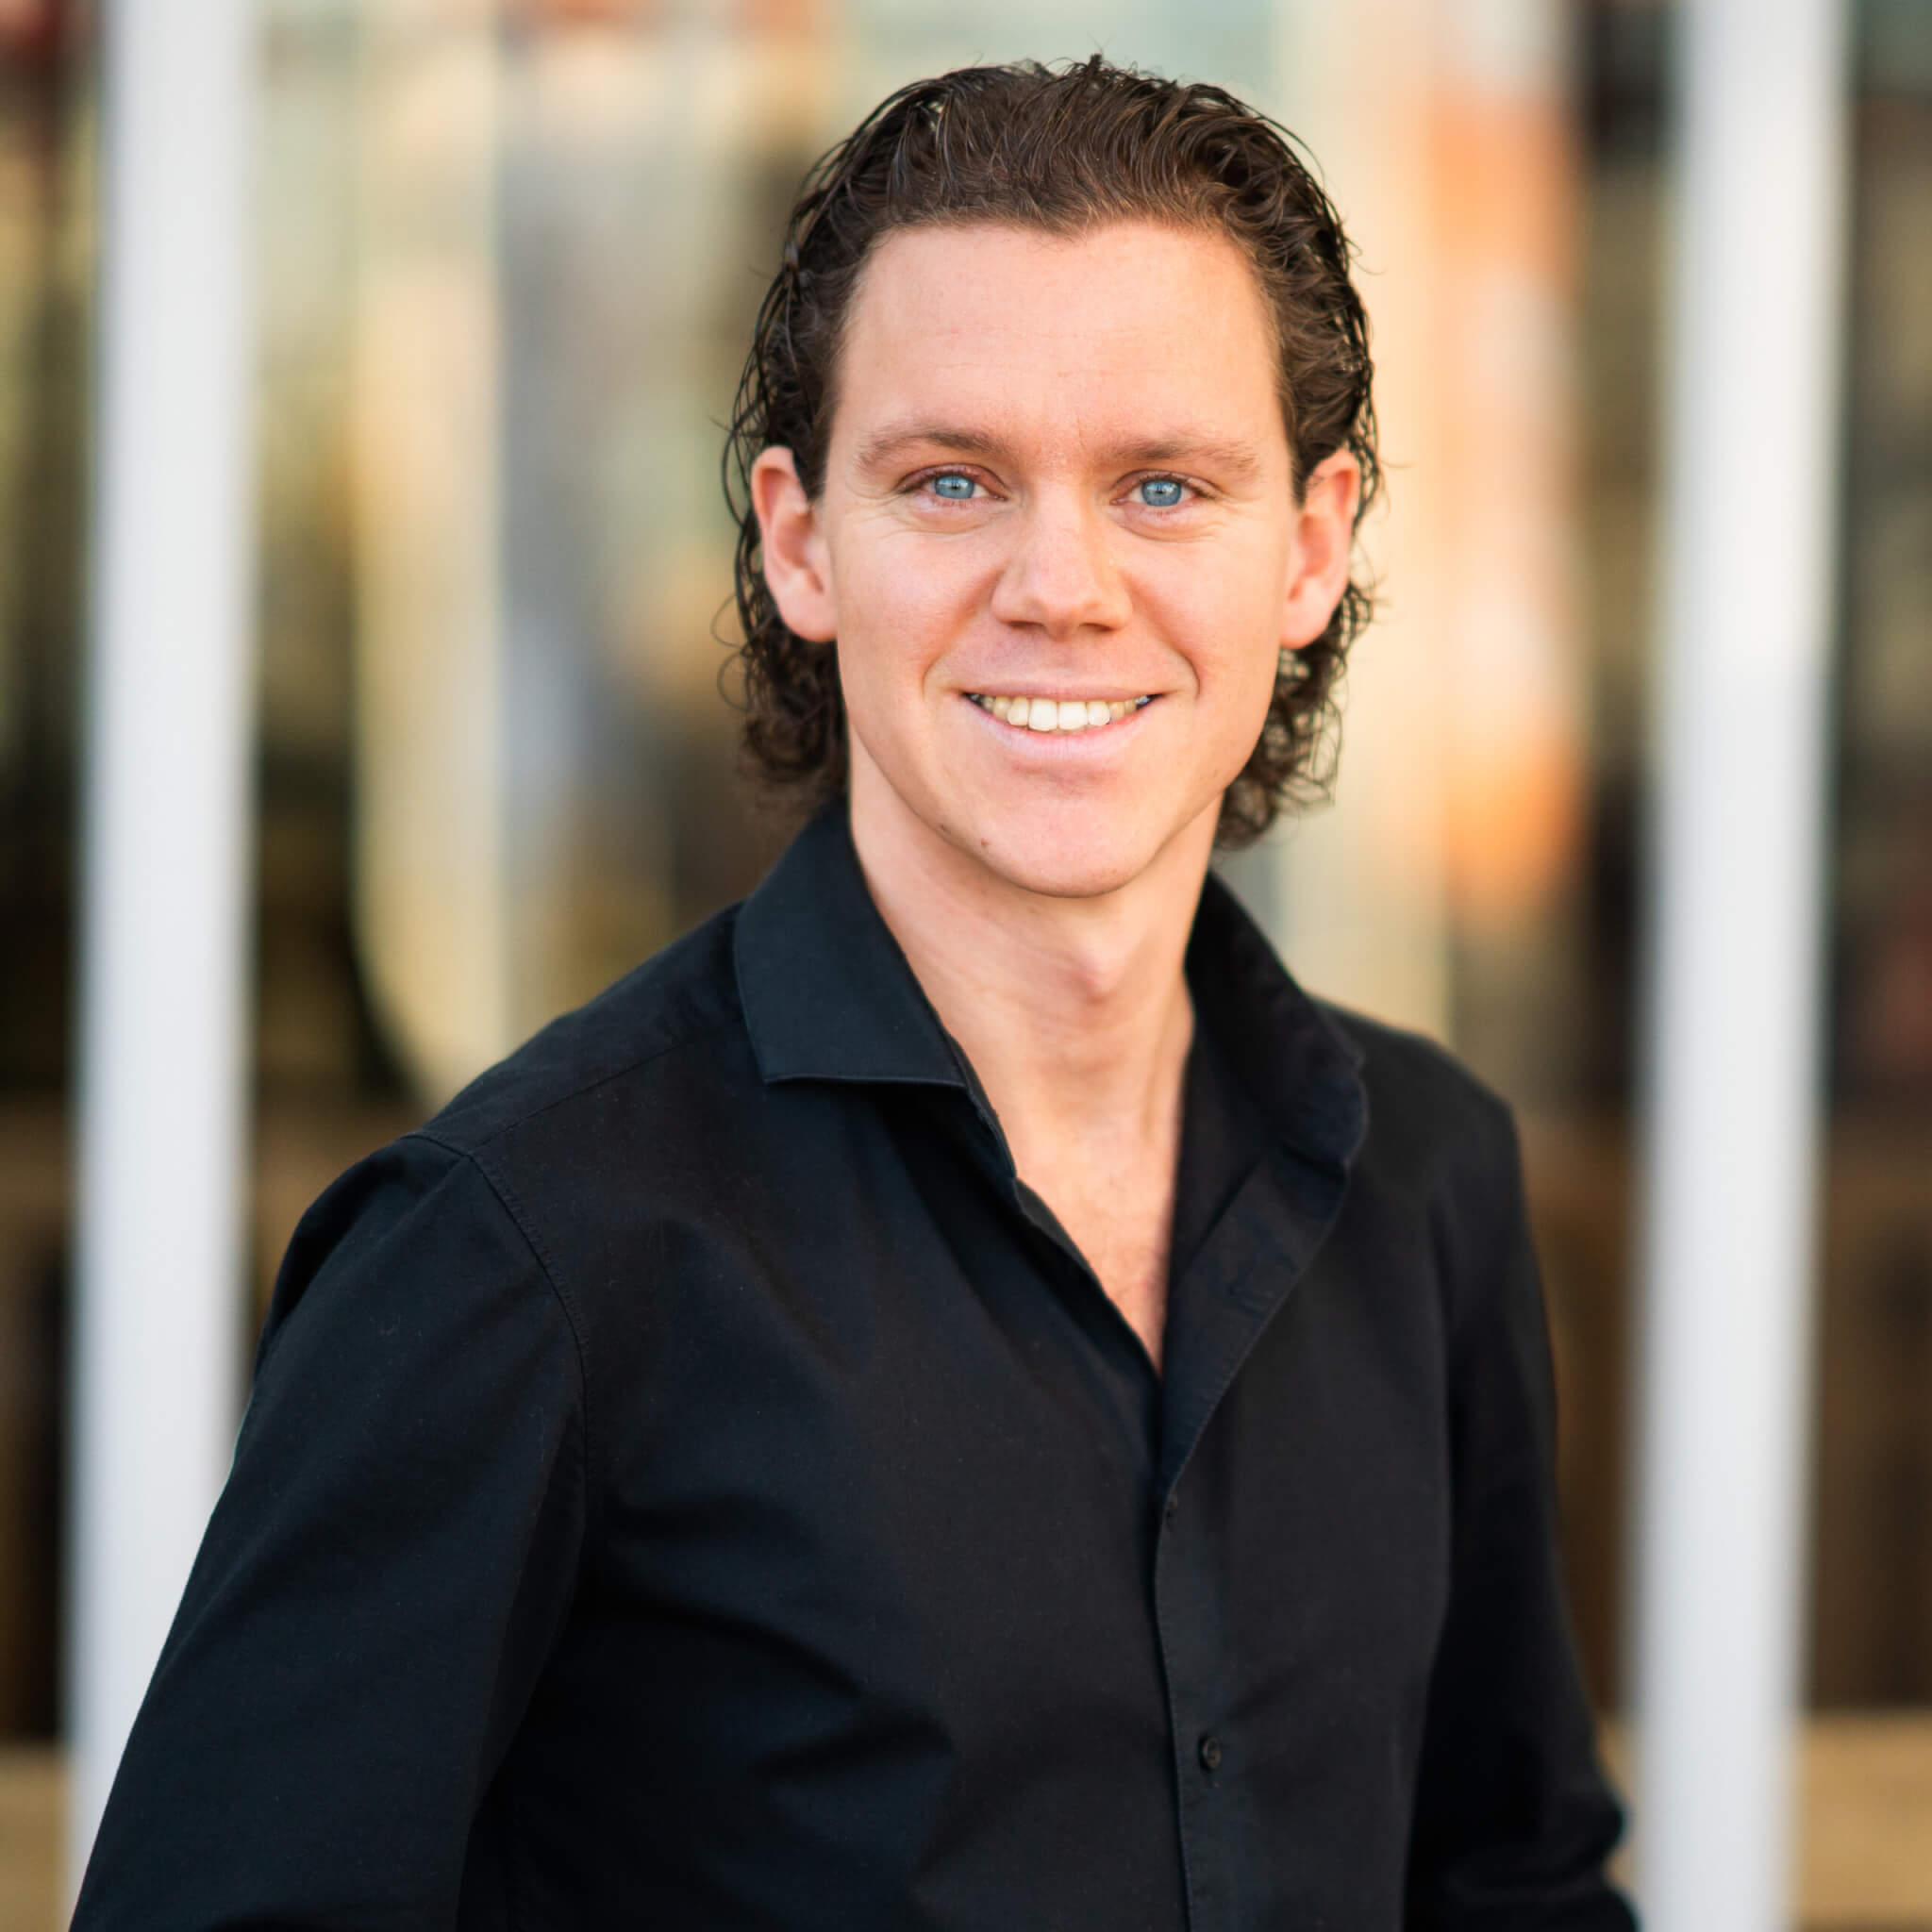 Michael Tijm